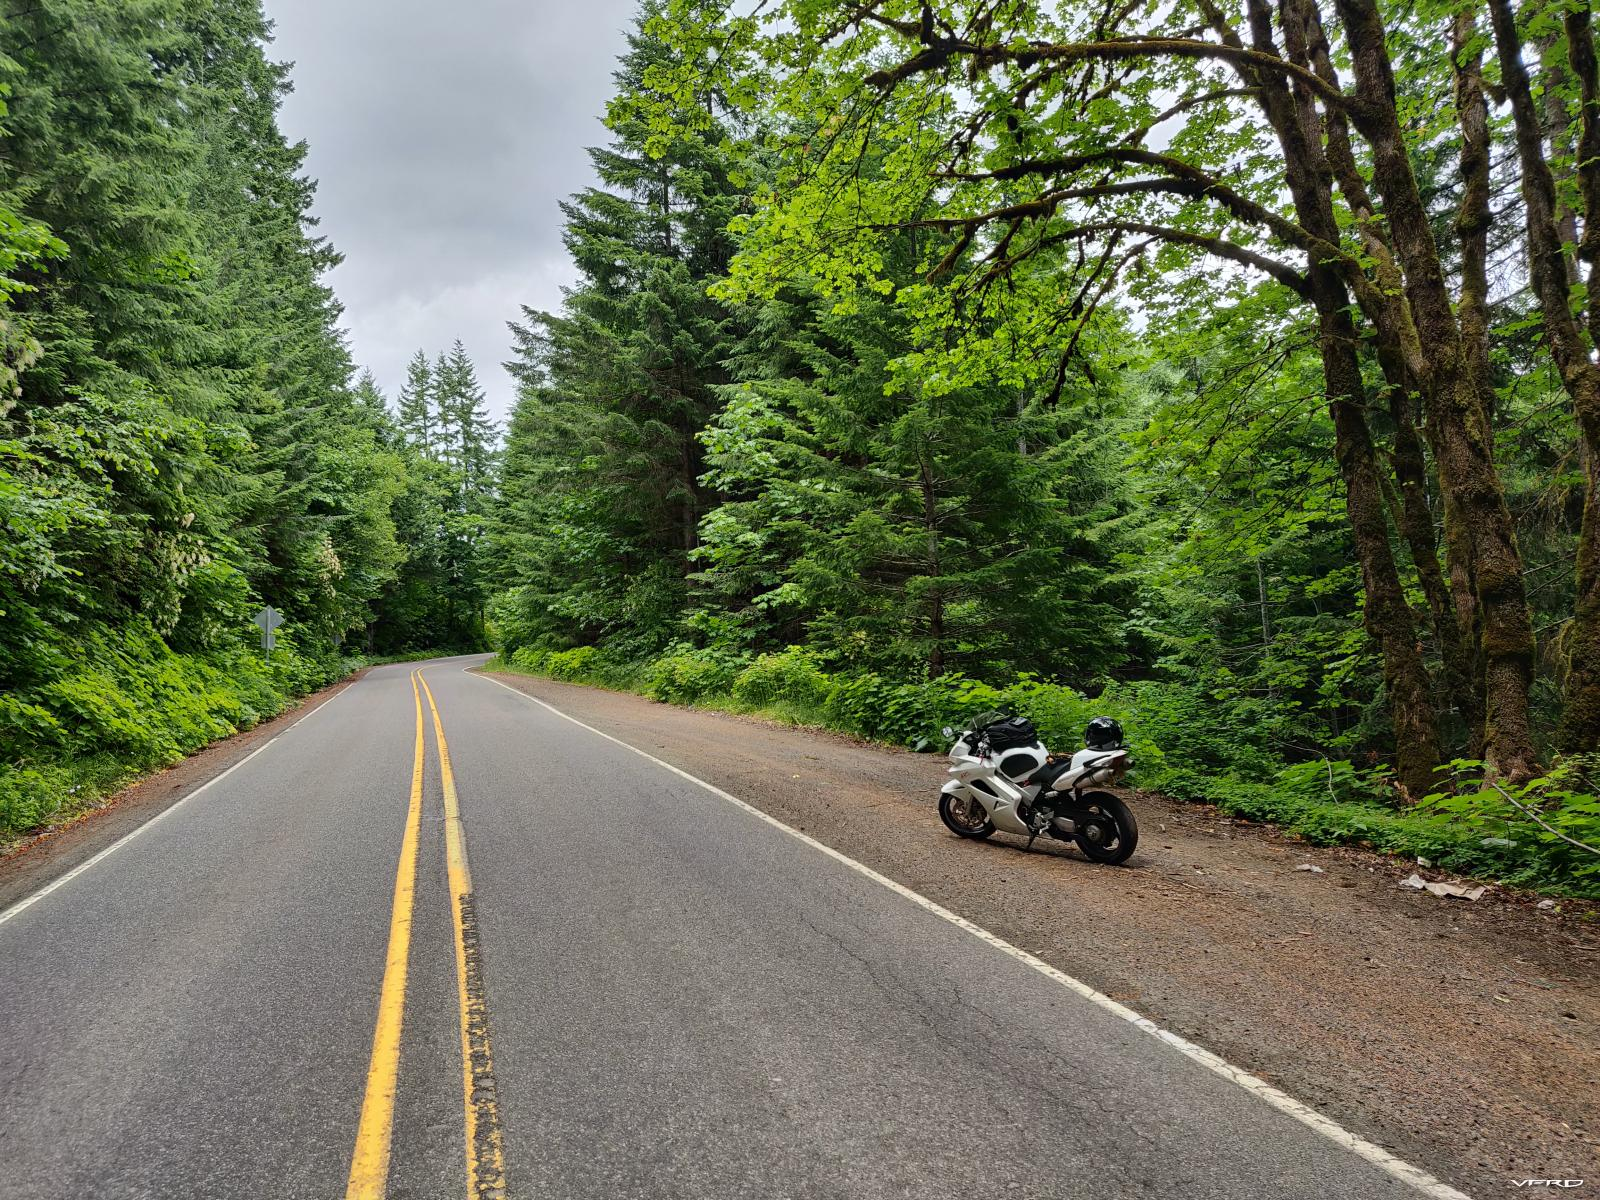 Timber Road